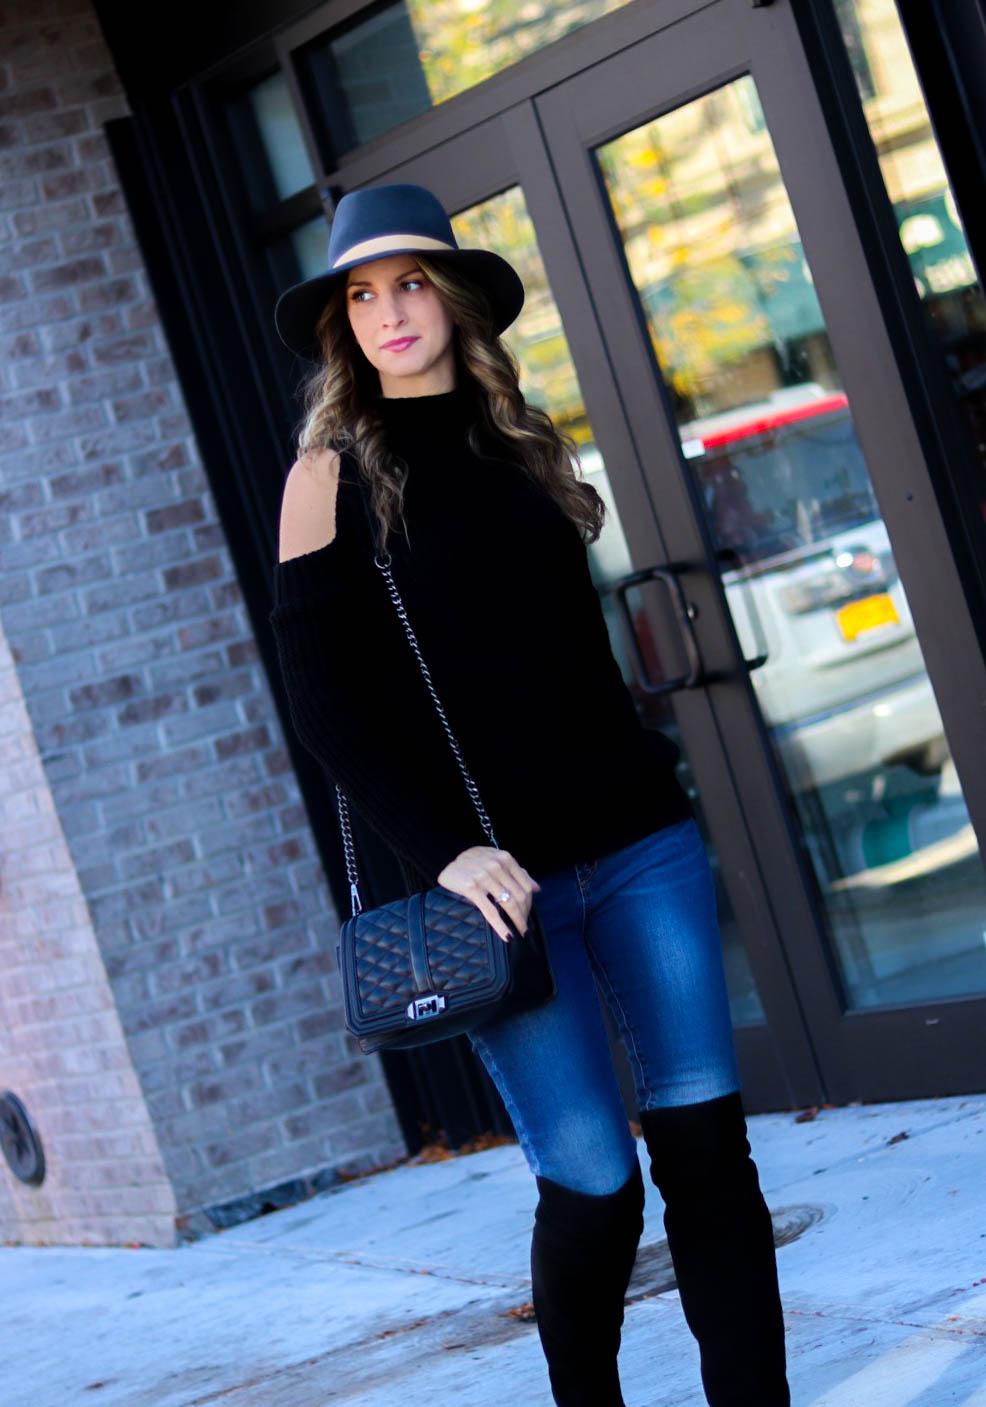 black hat outfit-3.jpg